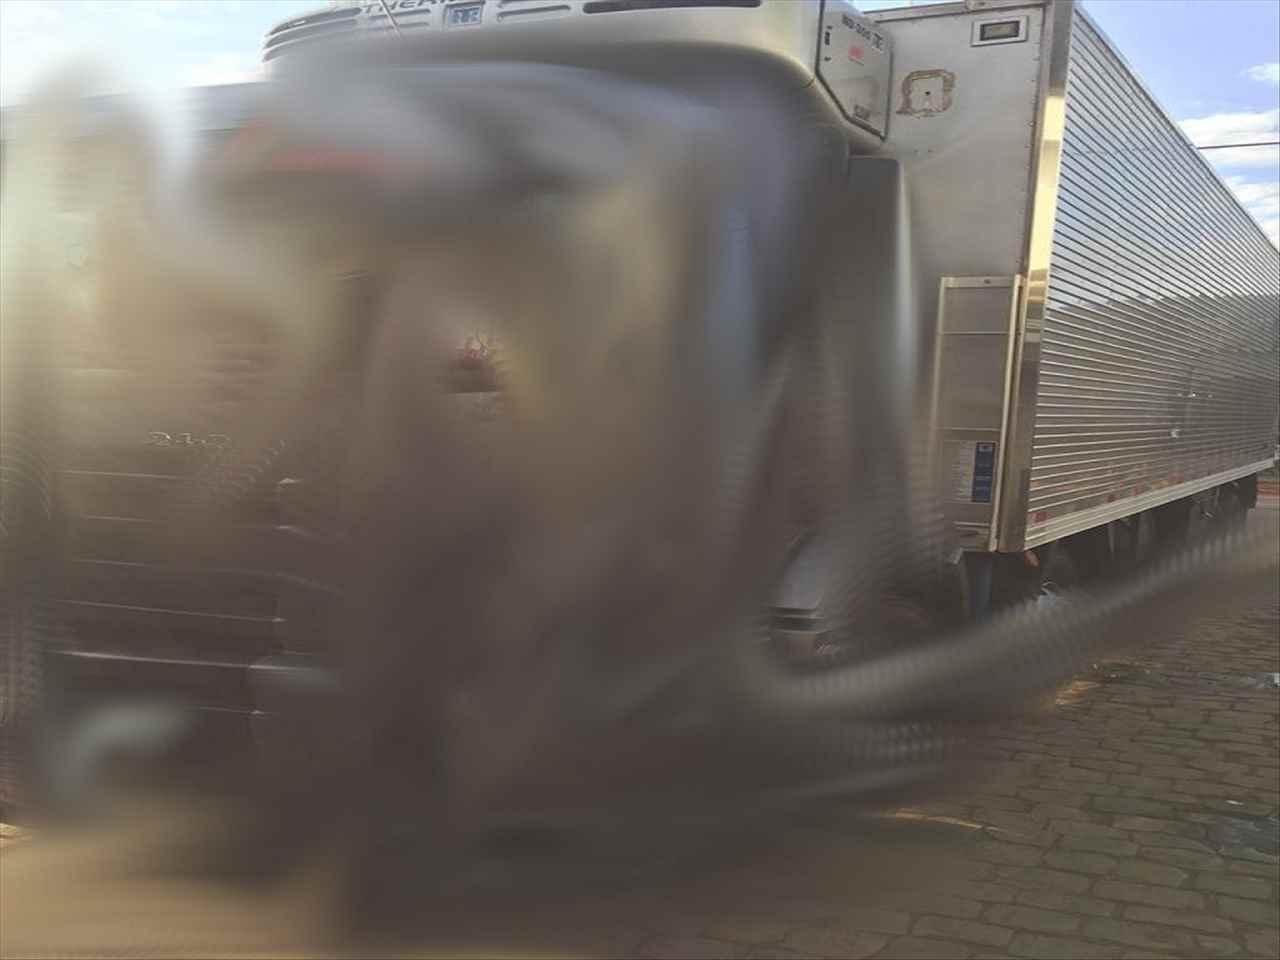 CARROCERIA SOBRE CHASSI  BITRUCK BAU TERMICO Maracavel Londrina Caminhões LONDRINA PARANÁ PR